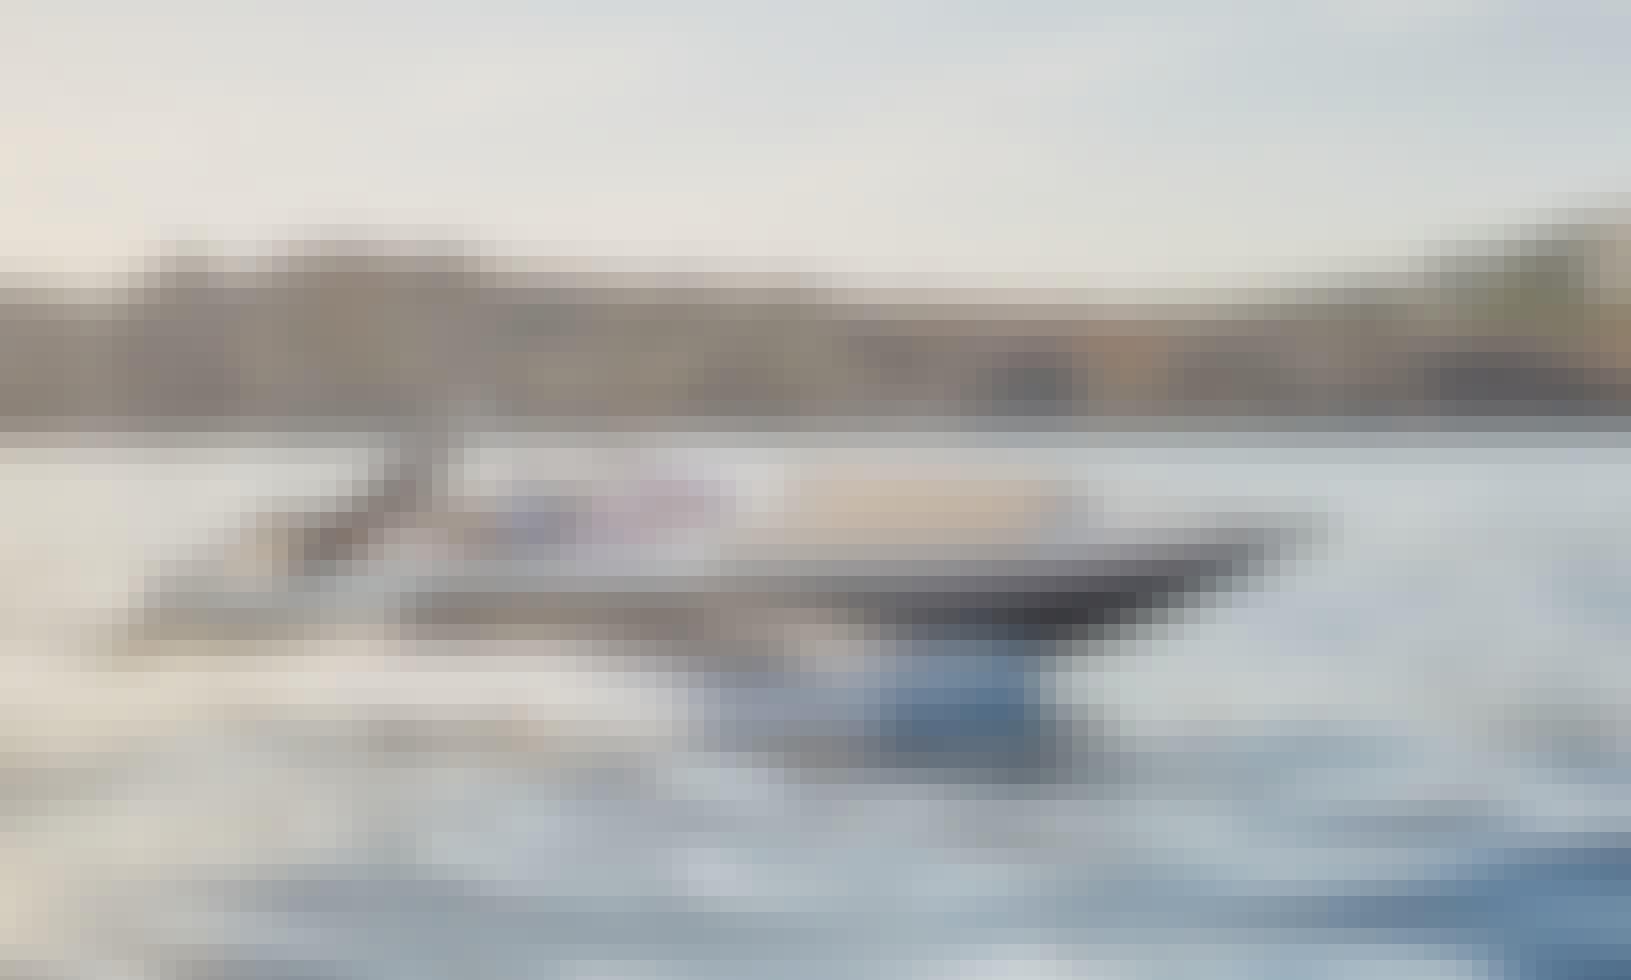 43' Sunseeker Thunderhawk for Charter in Eivissa, Islas Baleares